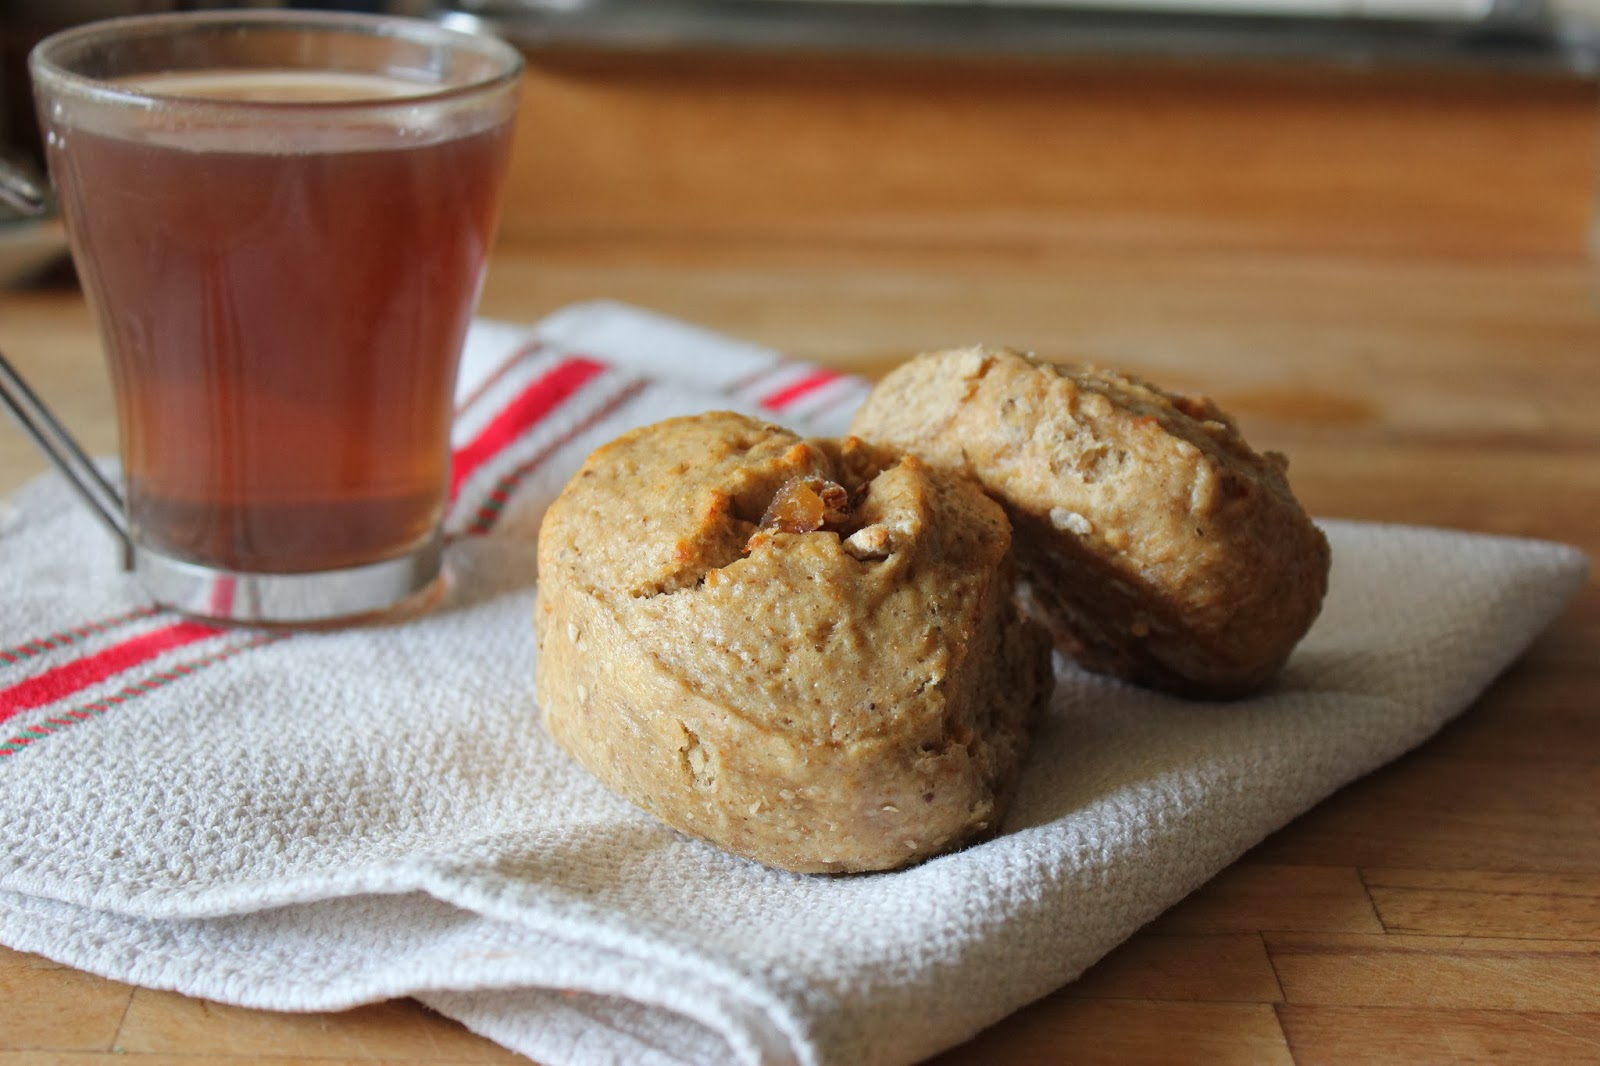 https://cuillereetsaladier.blogspot.com/2014/02/petites-brioches-vapeur-aux-marrons.html